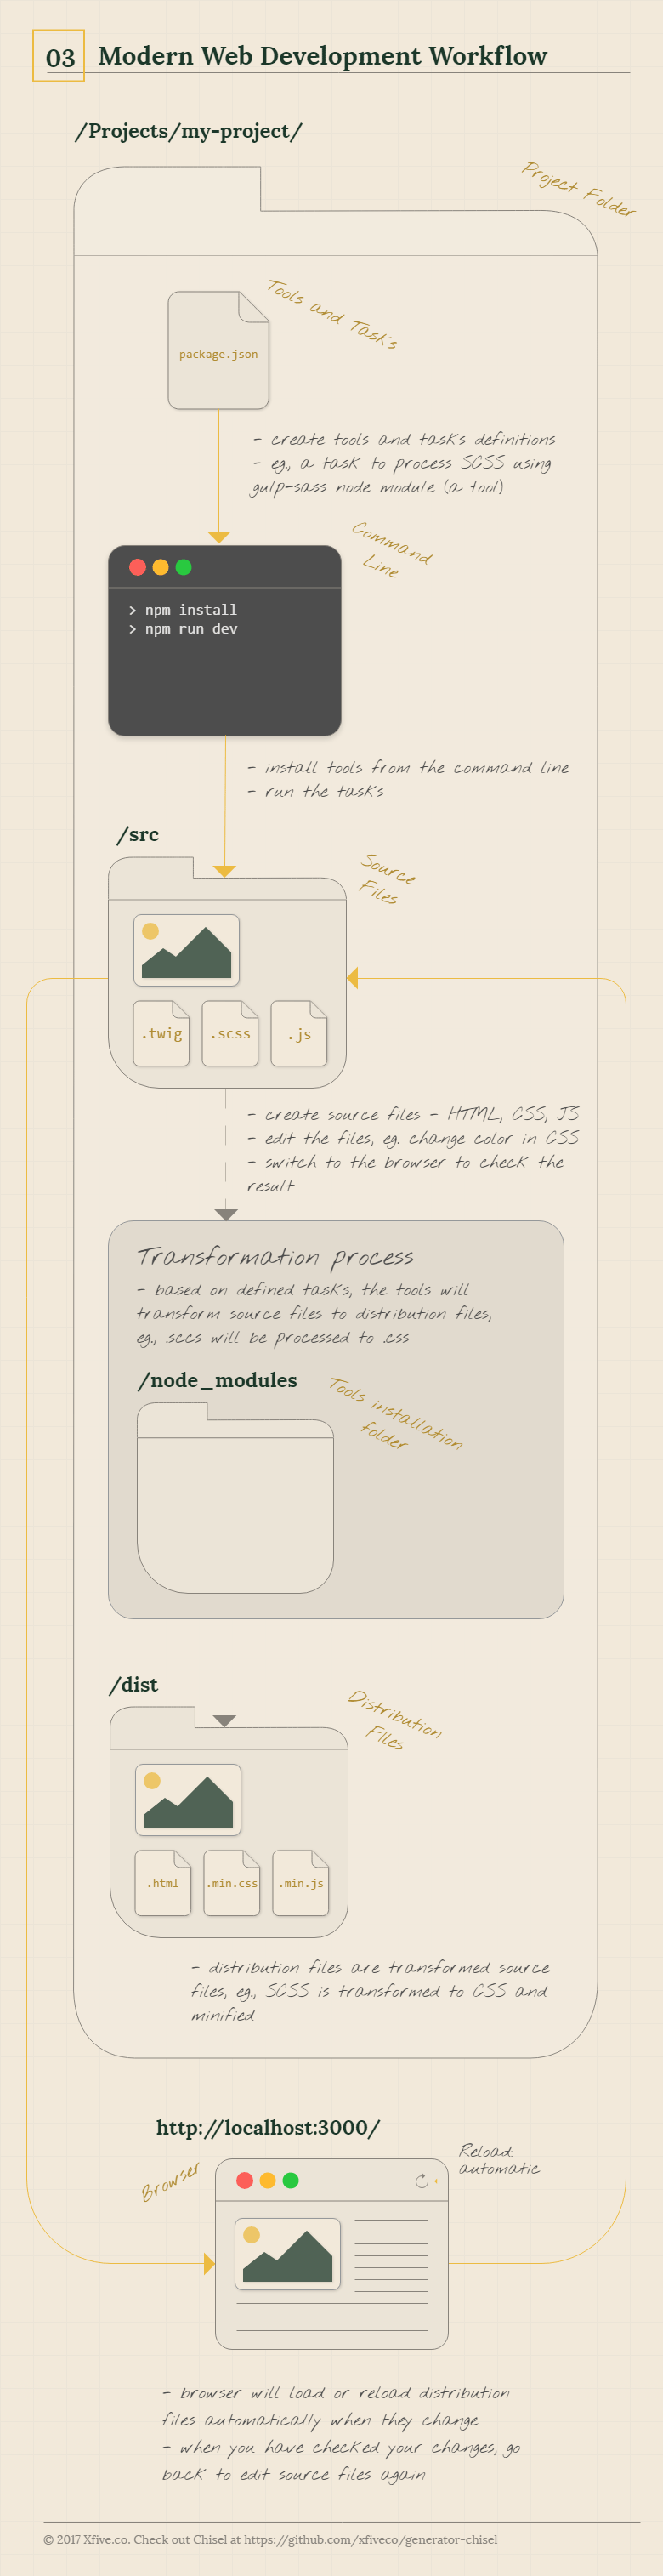 Modern Web Development Workflow